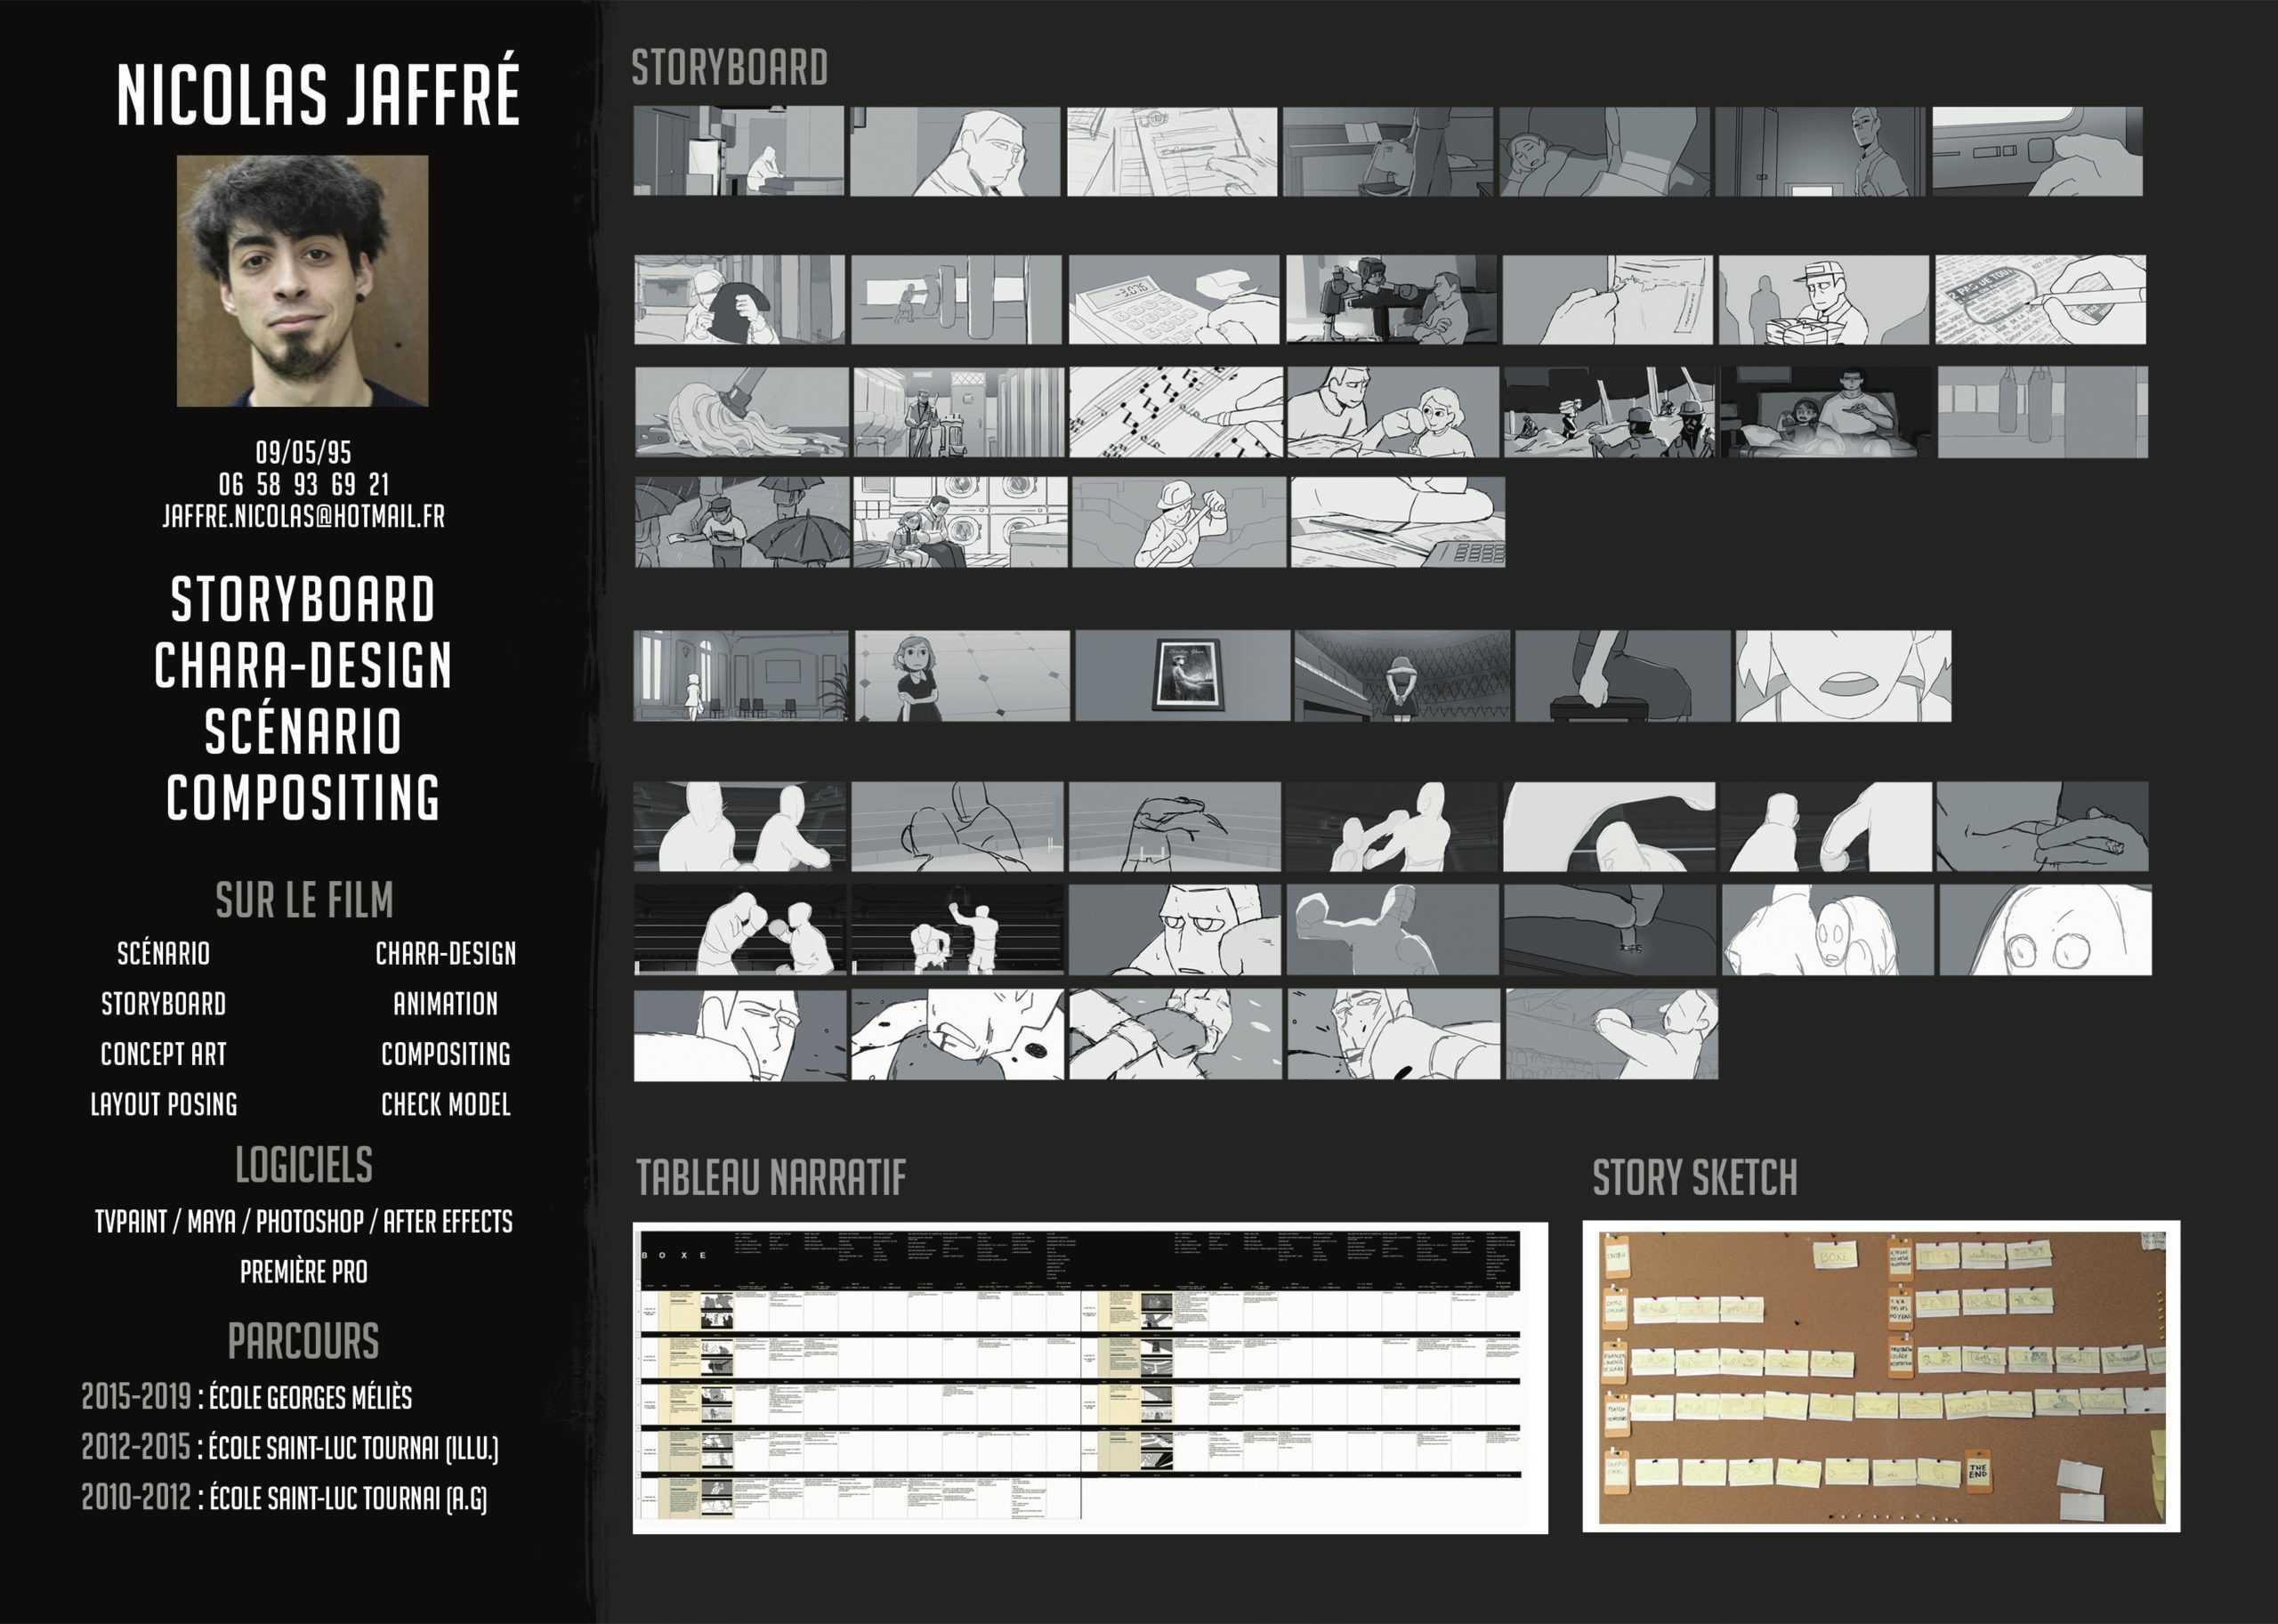 nicolas-jaffre-1-scaled.jpg